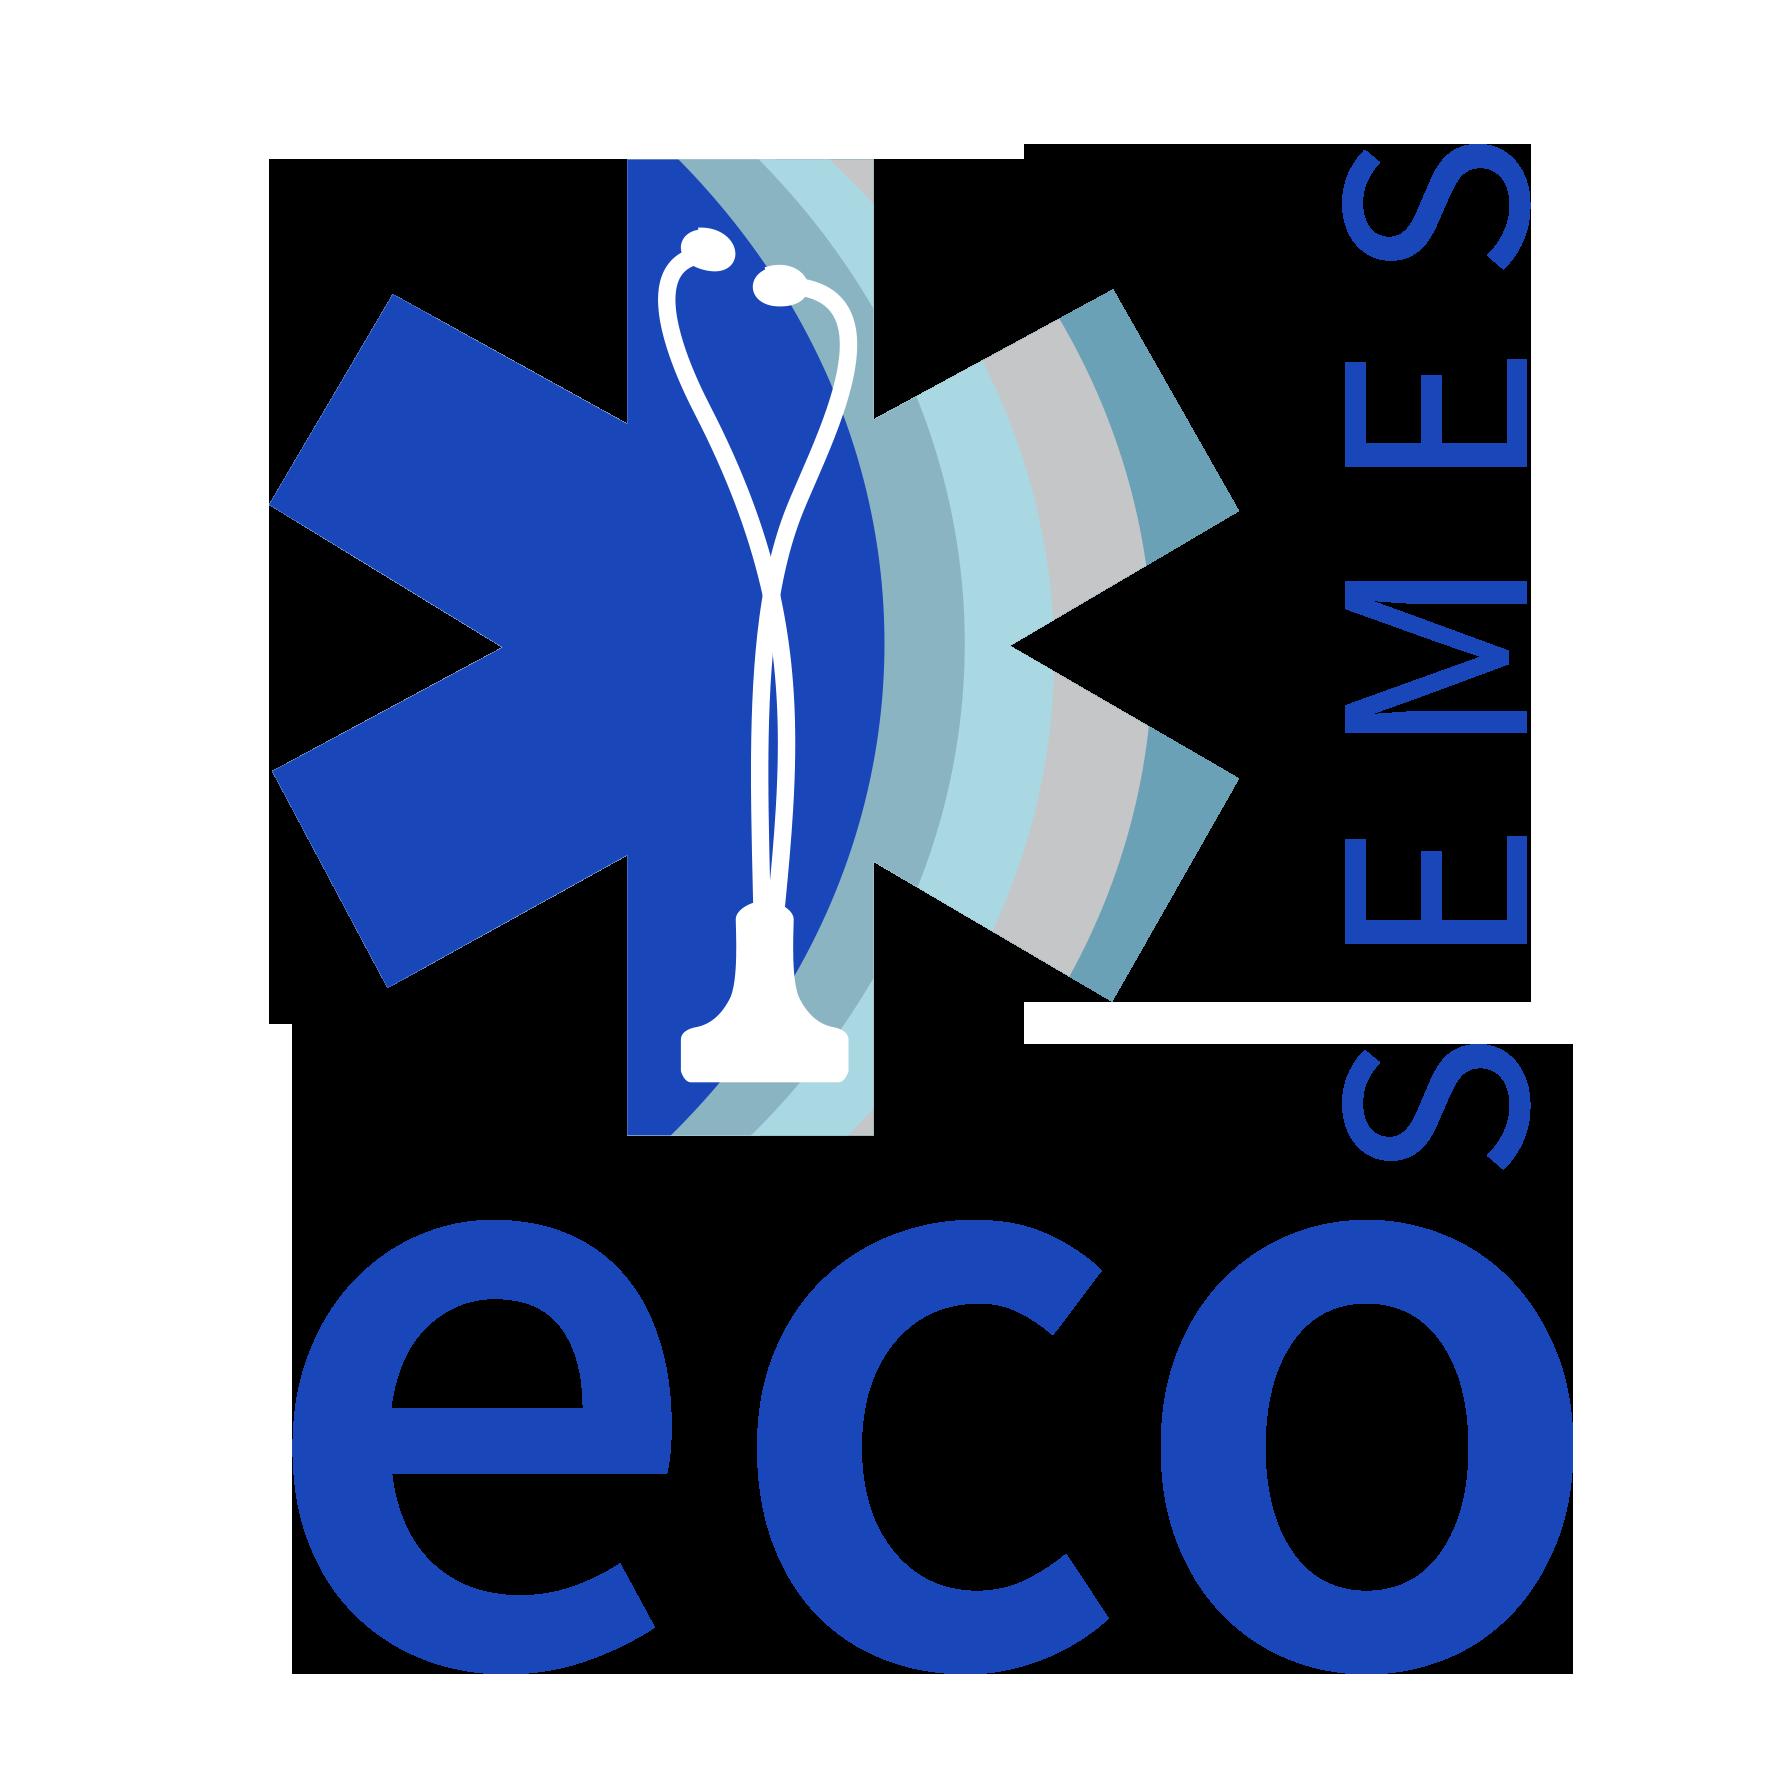 Eco_semes